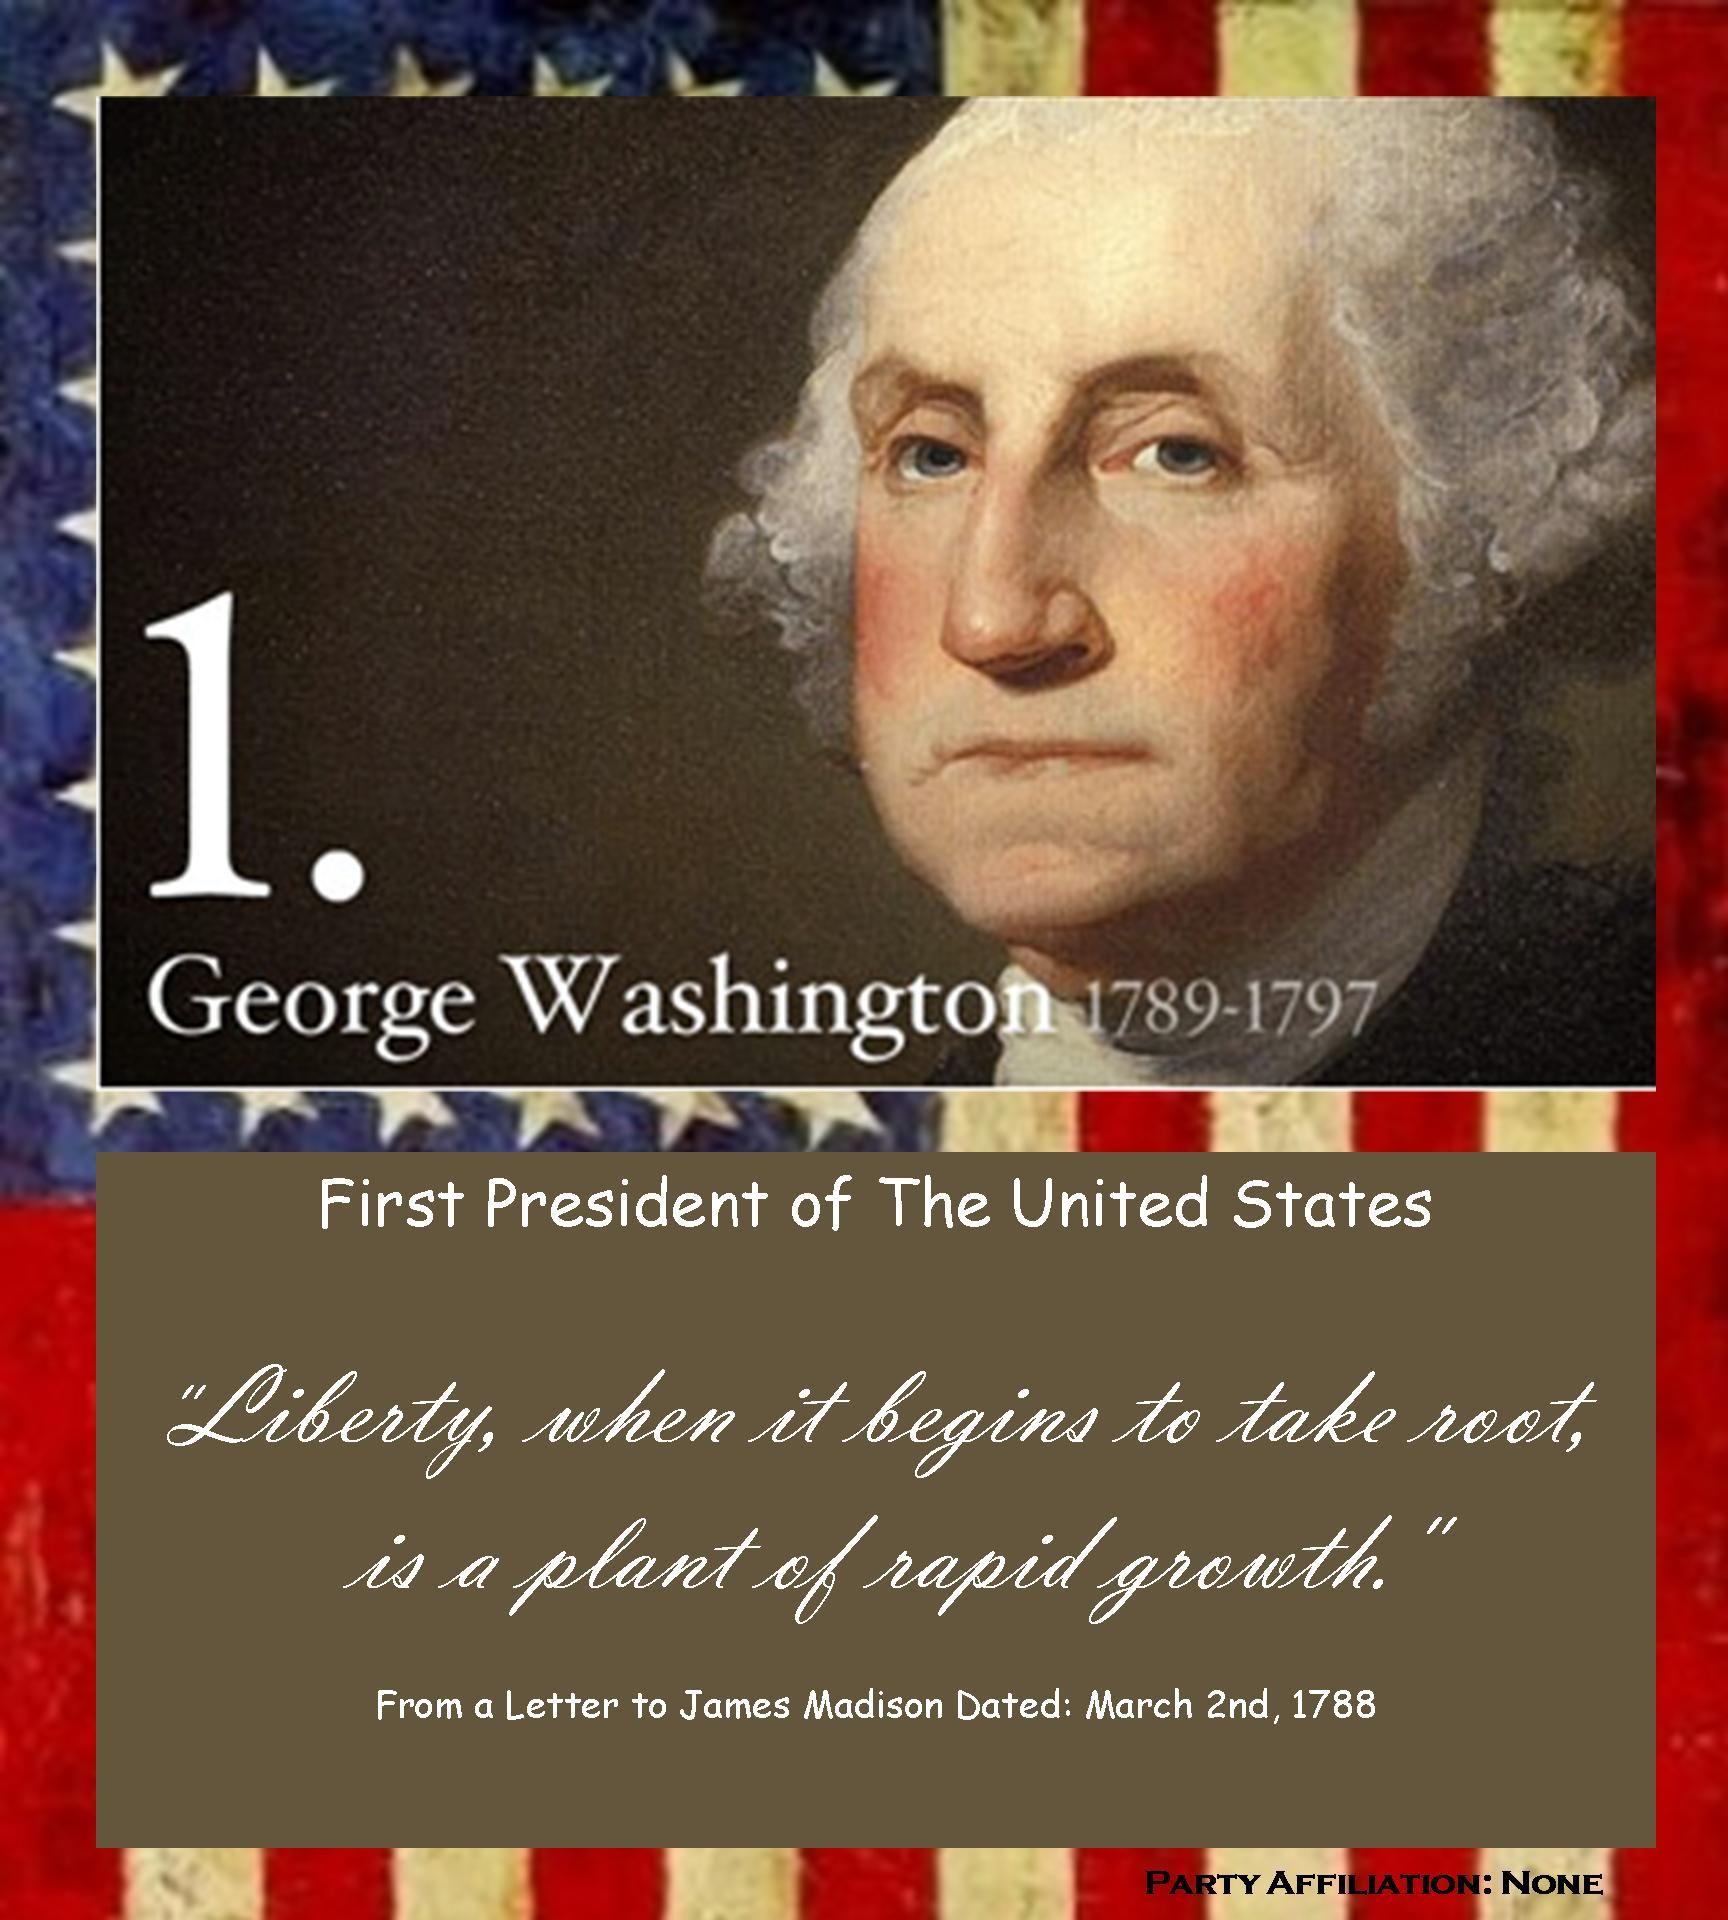 1789 George Washington Cbfecdadbfa